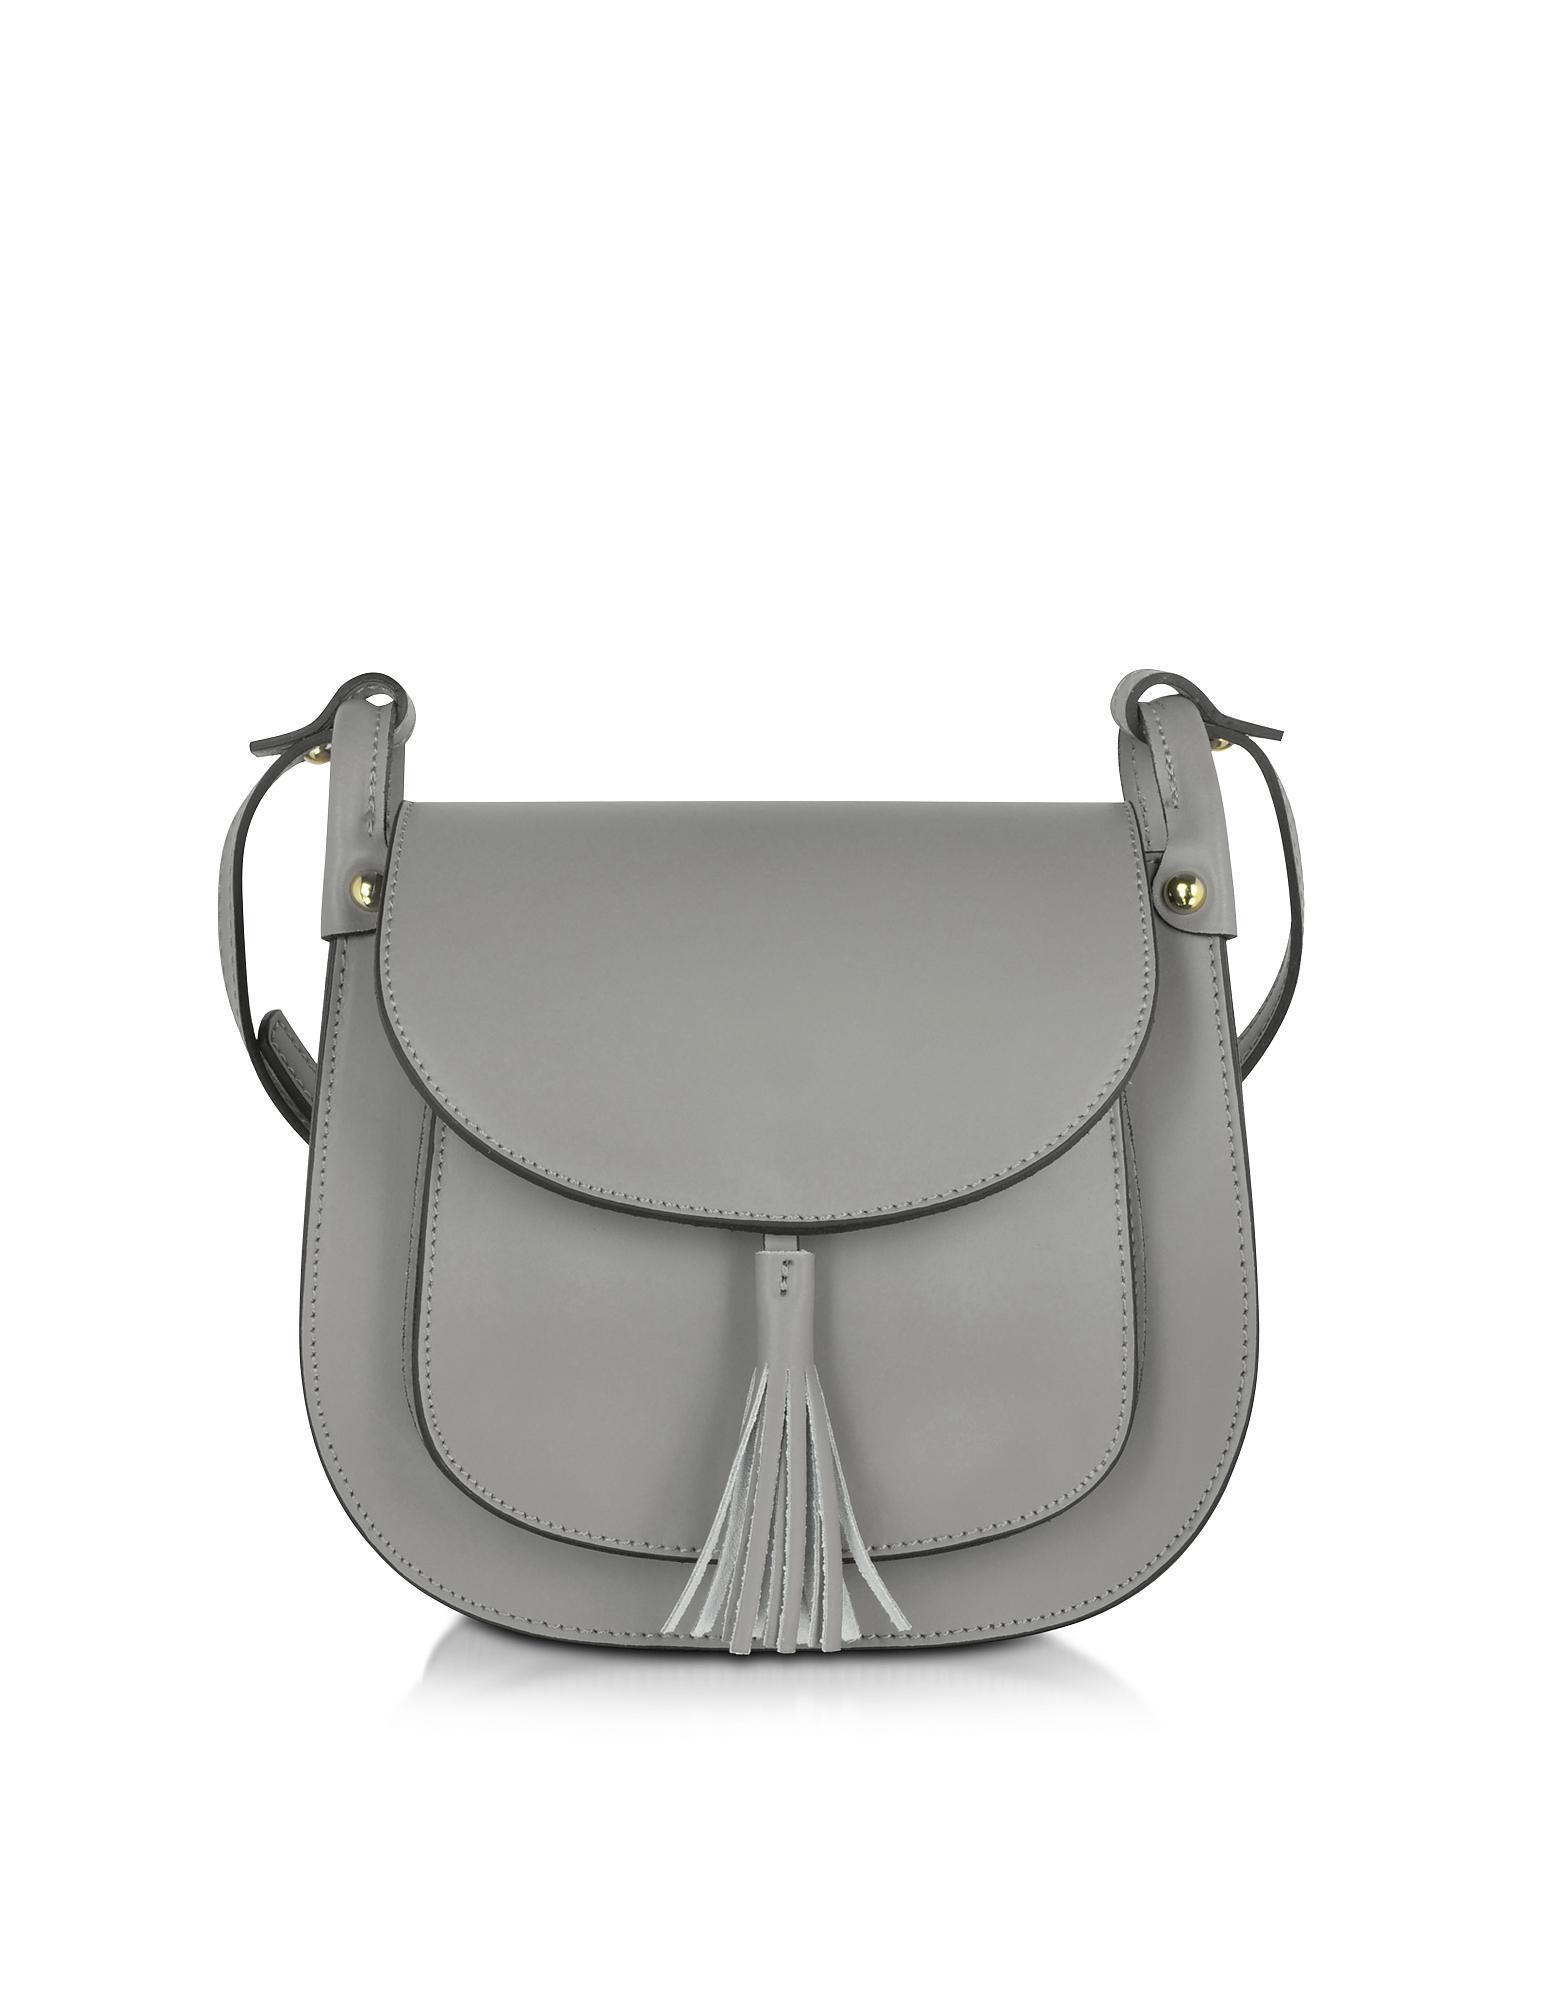 Le Parmentier Handbags, Buttercup Gray Leather Crossbody Bag